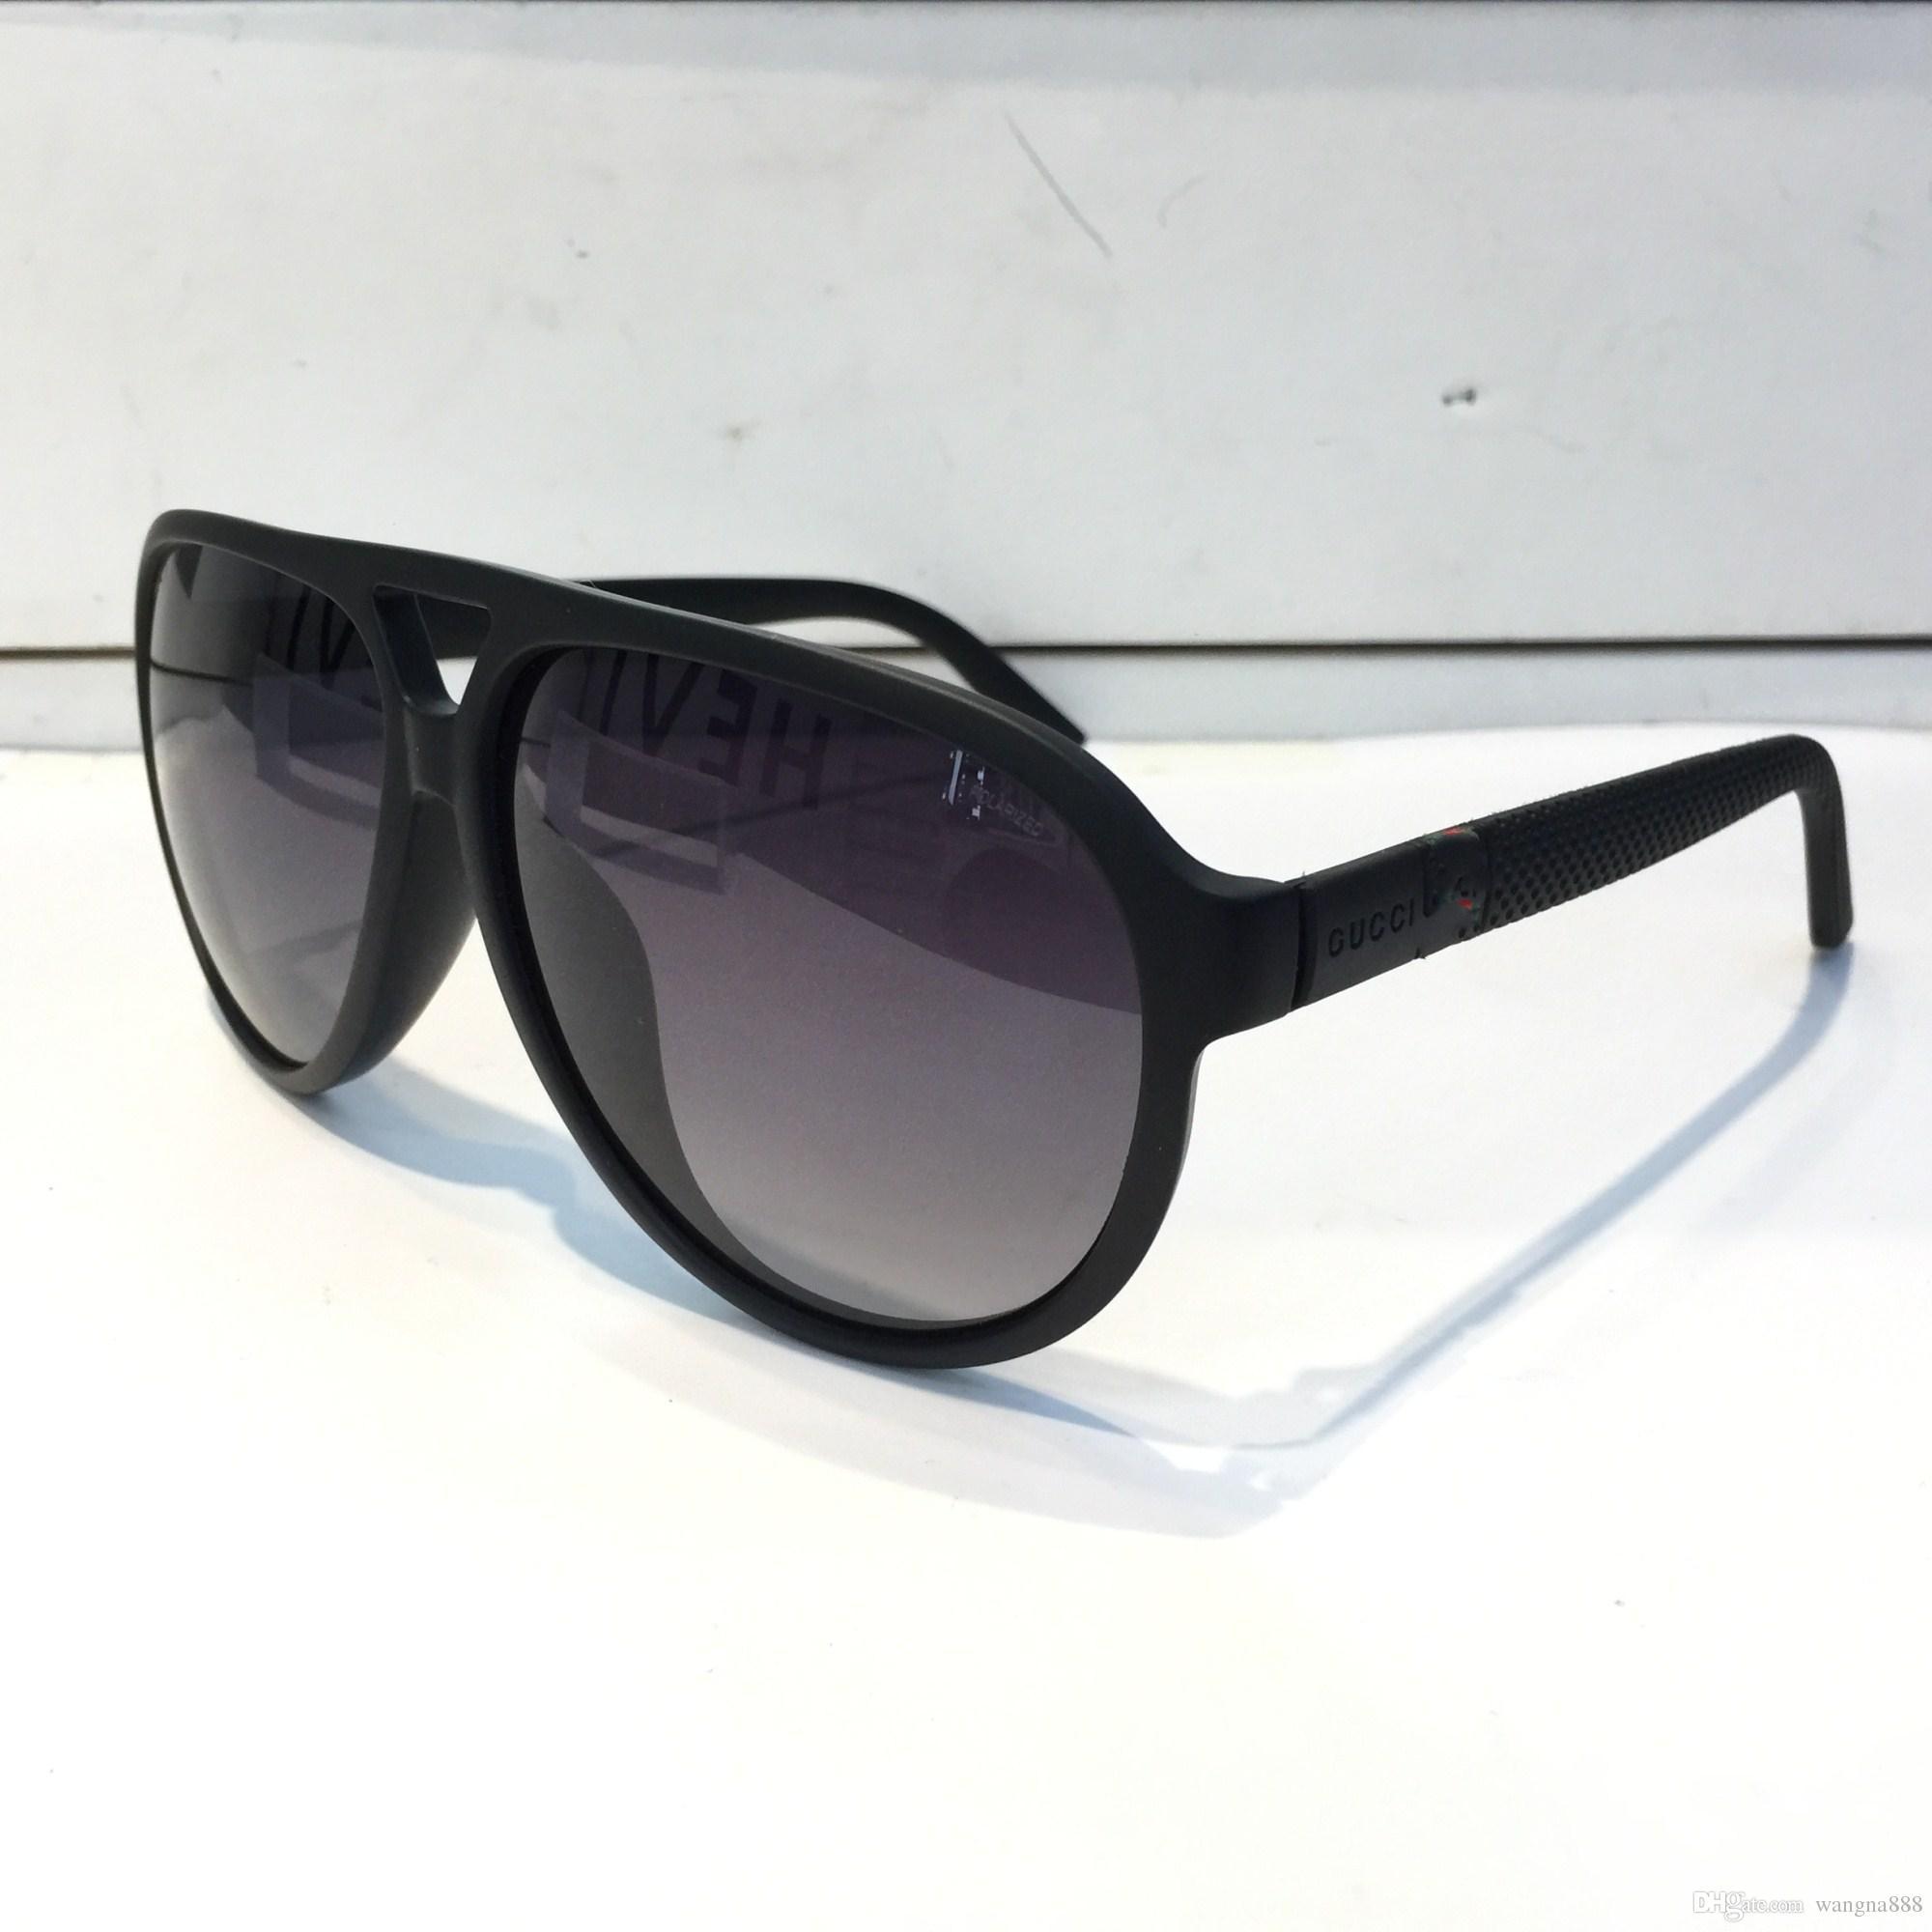 d6781574dcd6 Luxury 1065 Sunglasses For Men Design Fashion Sunglasses Wrap Sunglass Oval  Frame Coating Mirror Lens Carbon Fiber Summer Style With Case Cat Eye  Sunglasses ...